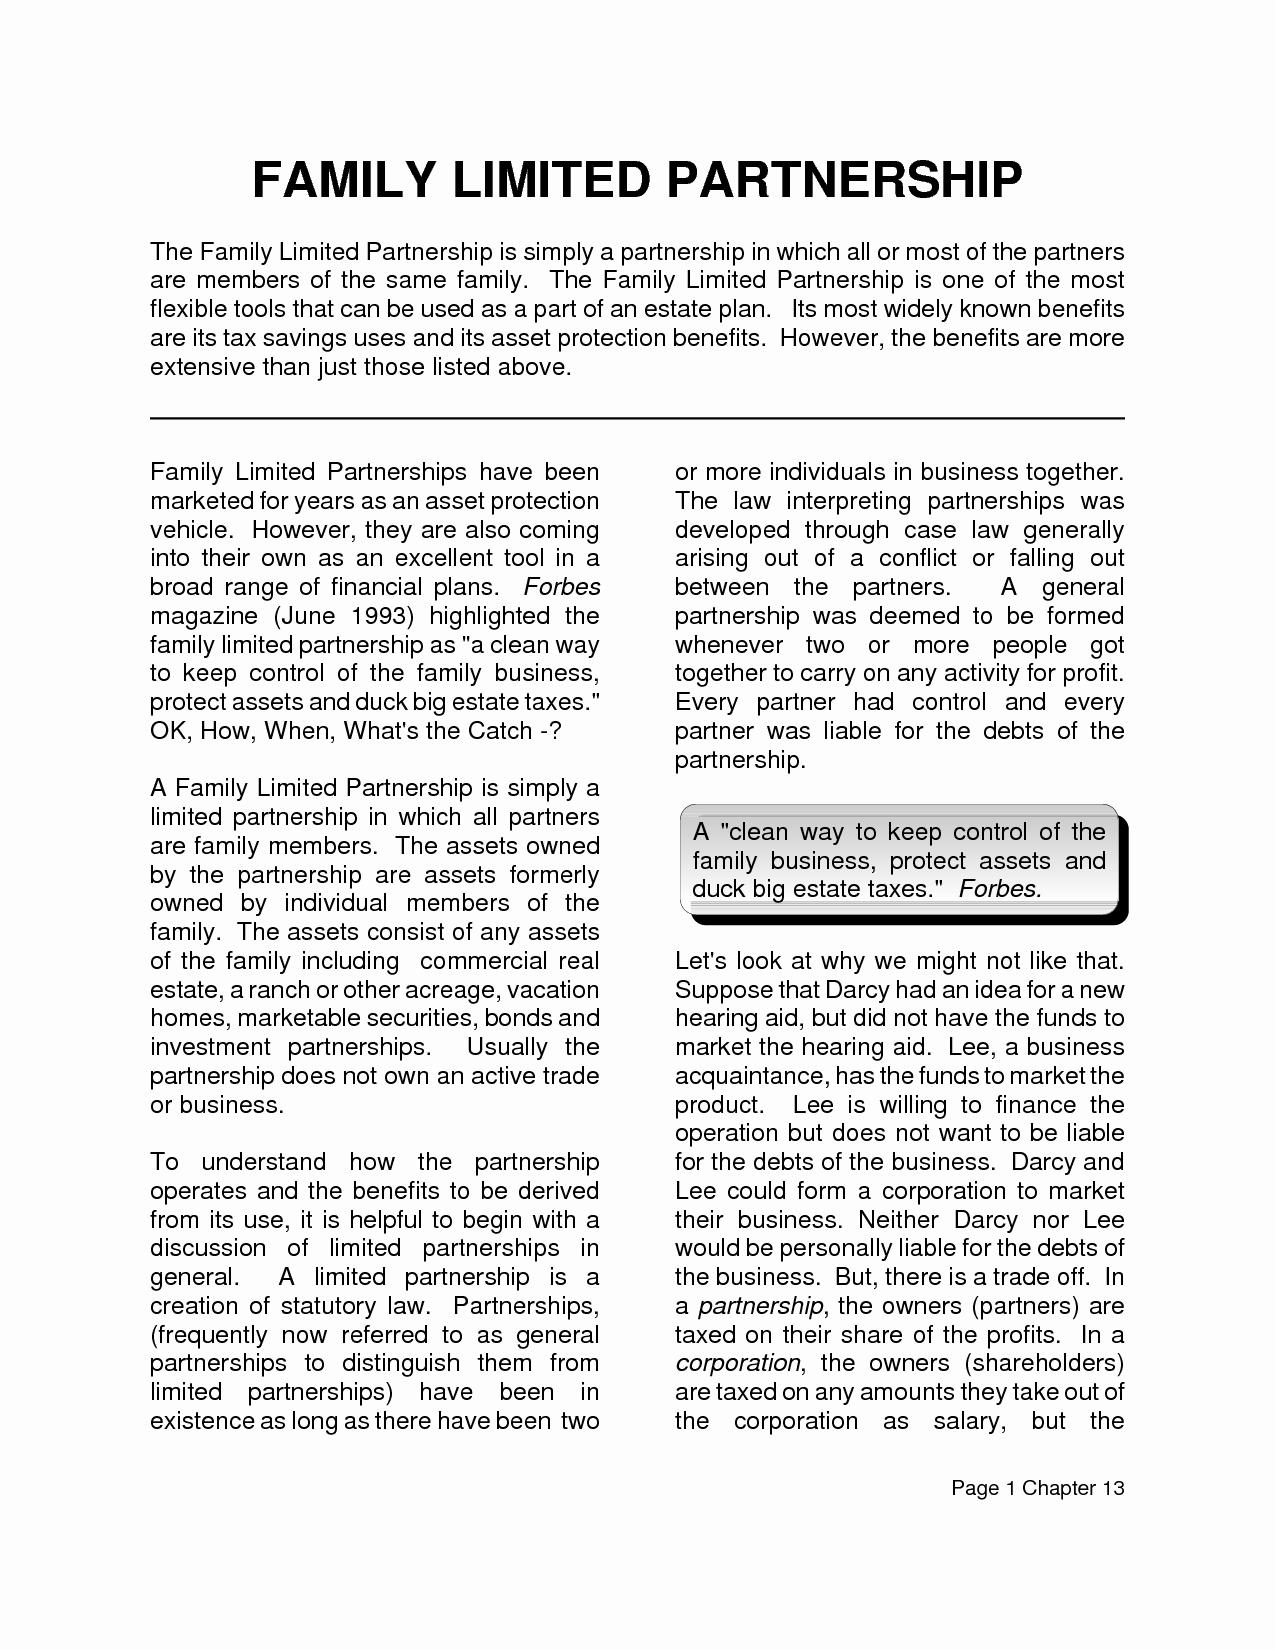 Limited Partnership Agreement Template Elegant 10 Best Of Family Partnership Agreement Templates